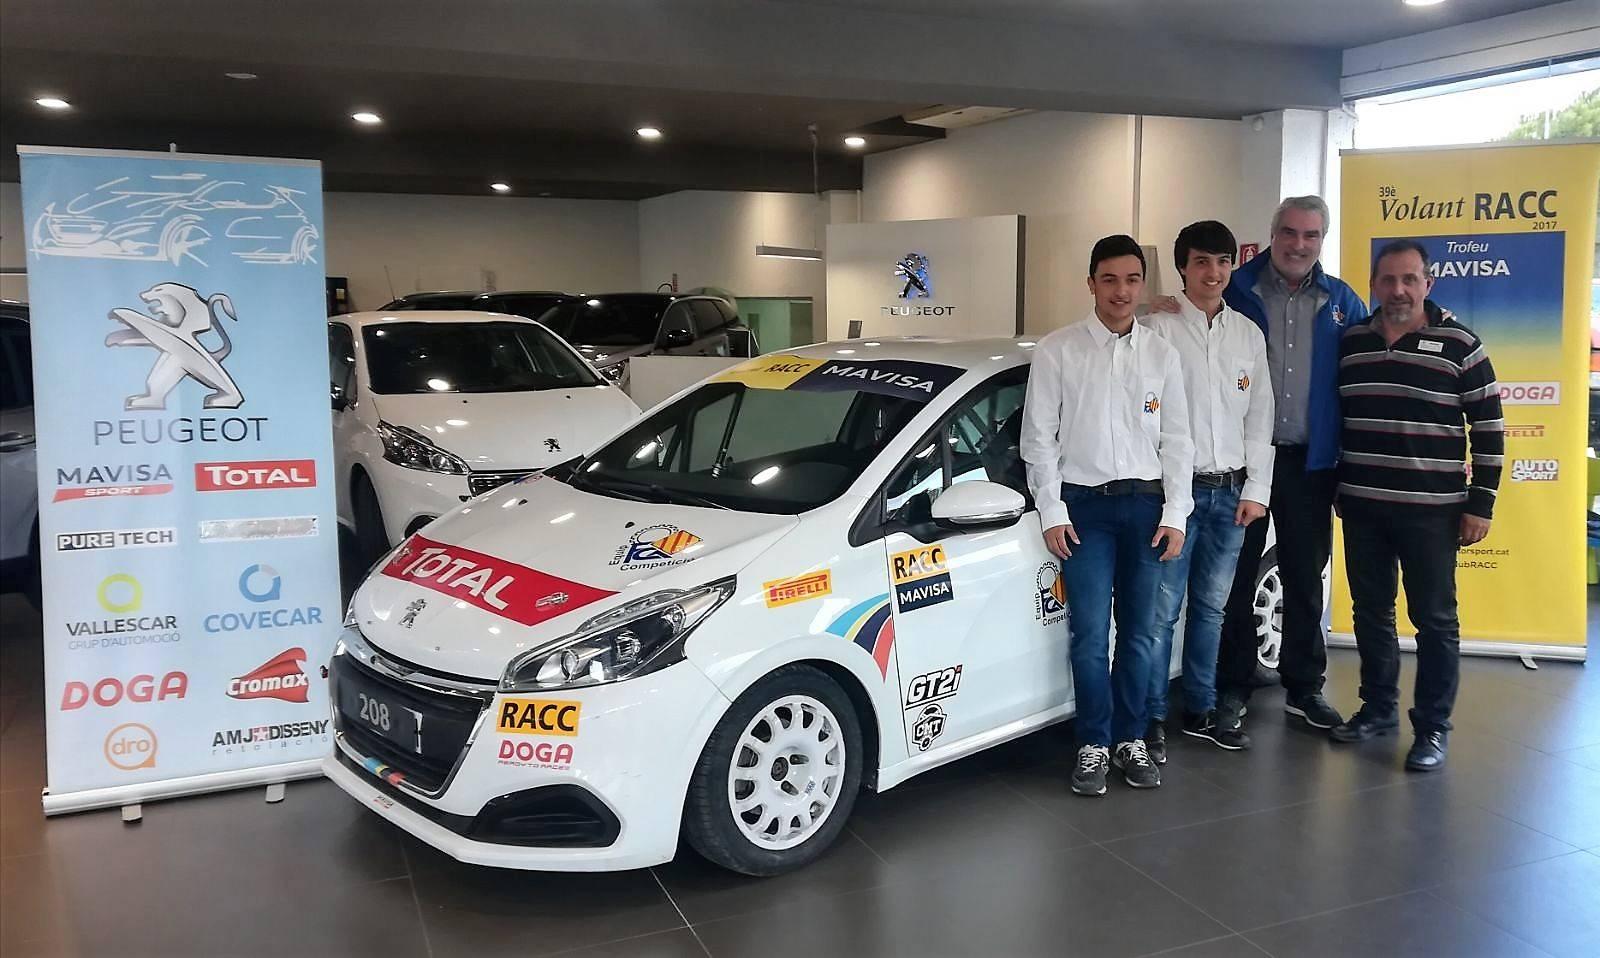 Roger y Ferran Aymerich participaran al Volant RACC amb la beca de la FCA